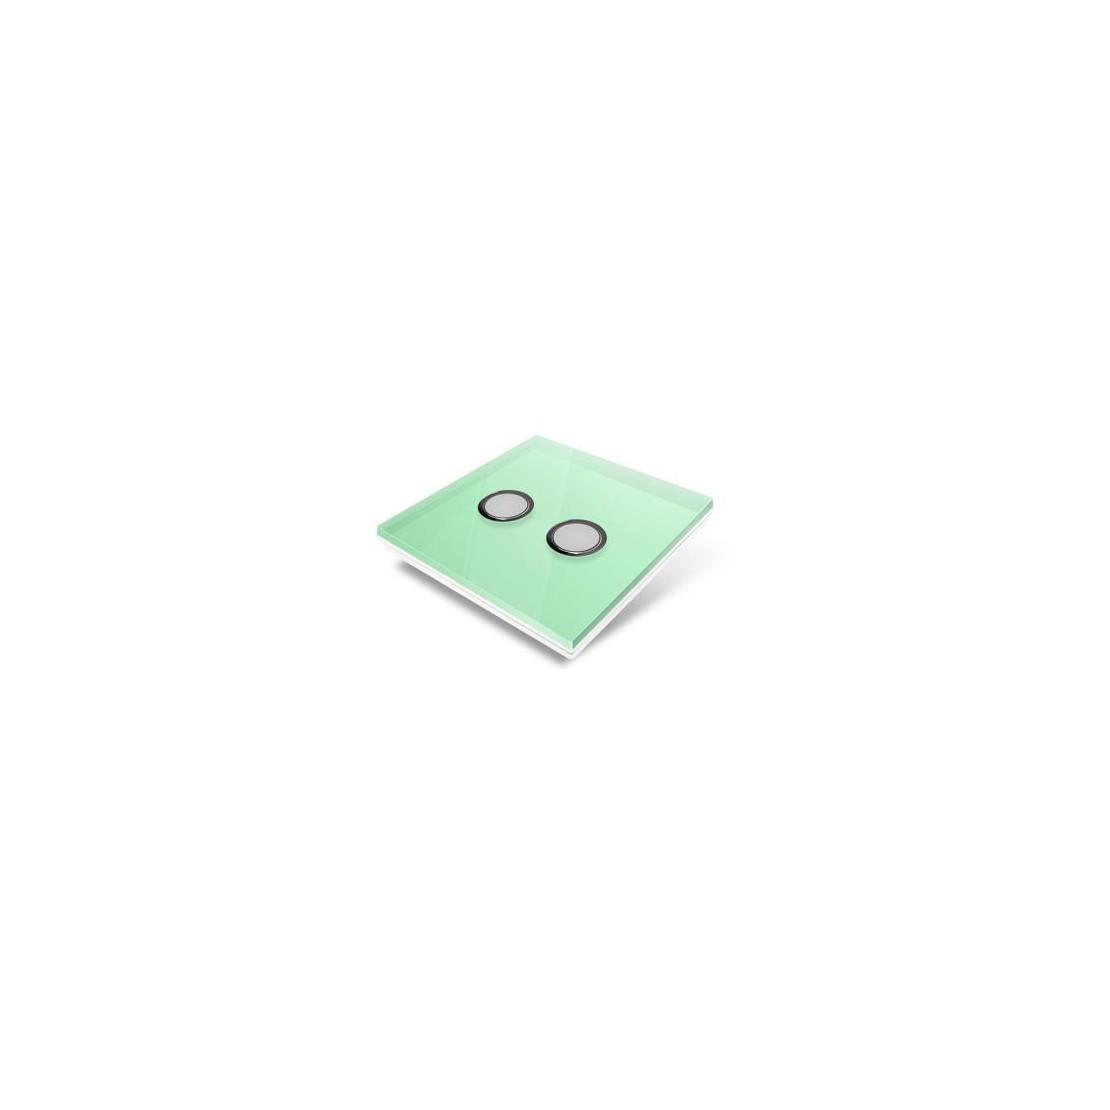 Tampa de cobertura para interruptor Edisio - cristal verde